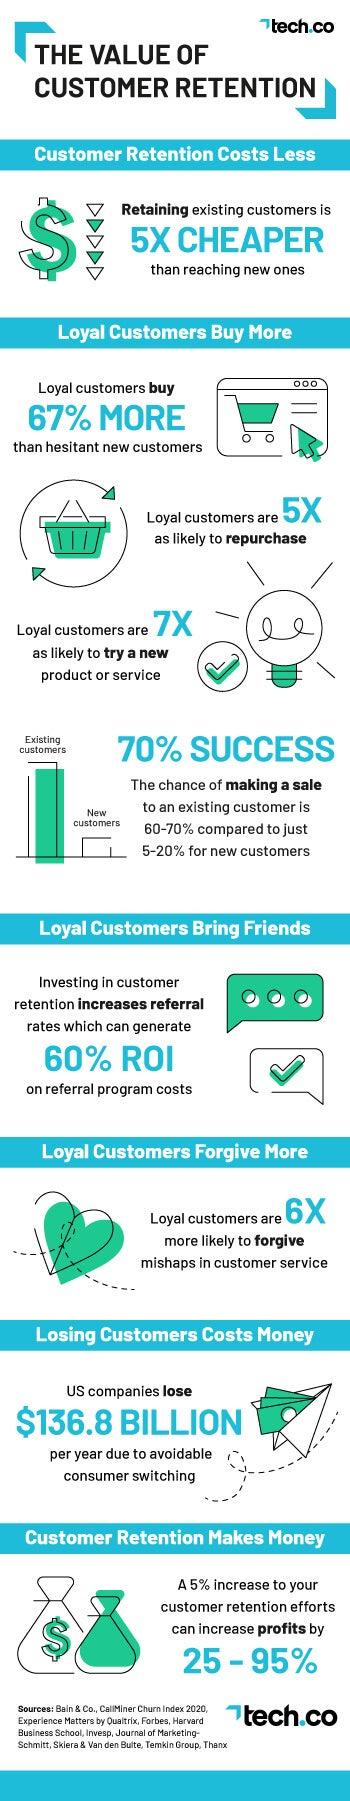 Customer Retention Strategies Infographic